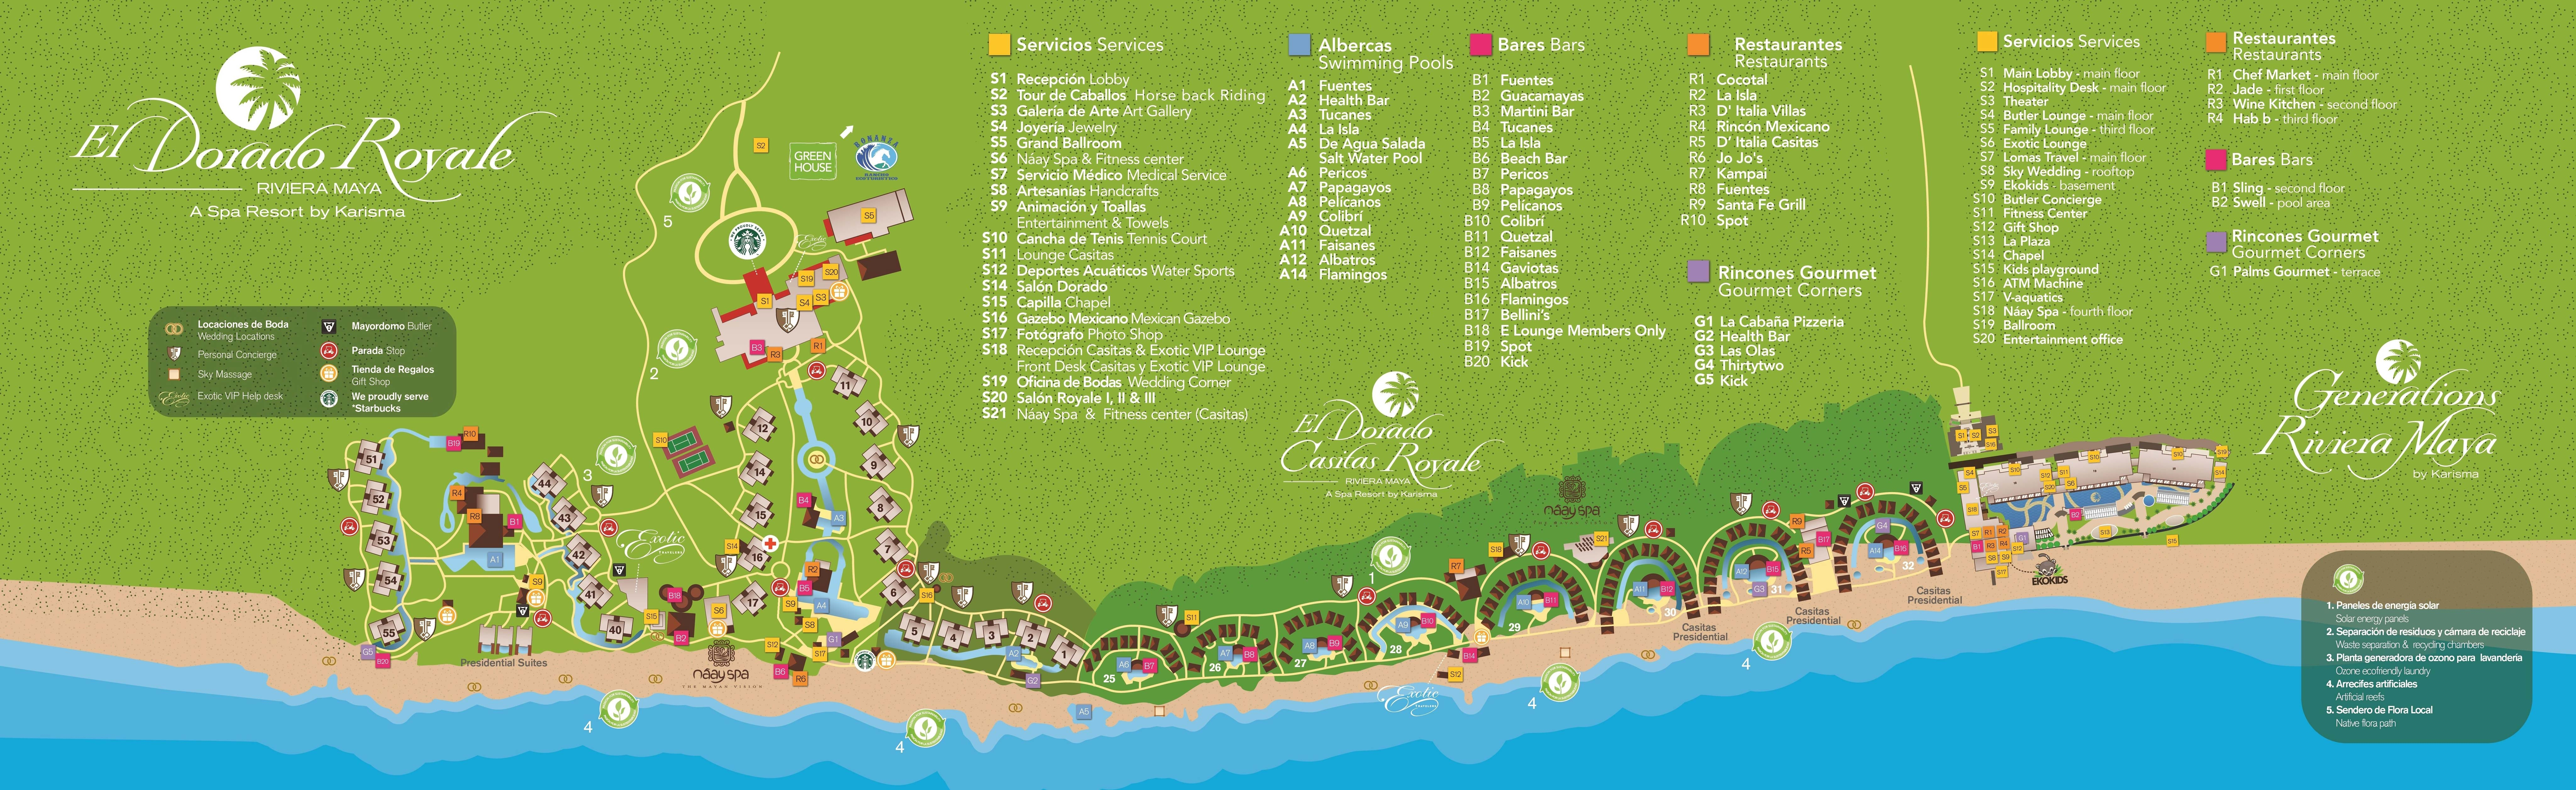 Explore The Resort Map